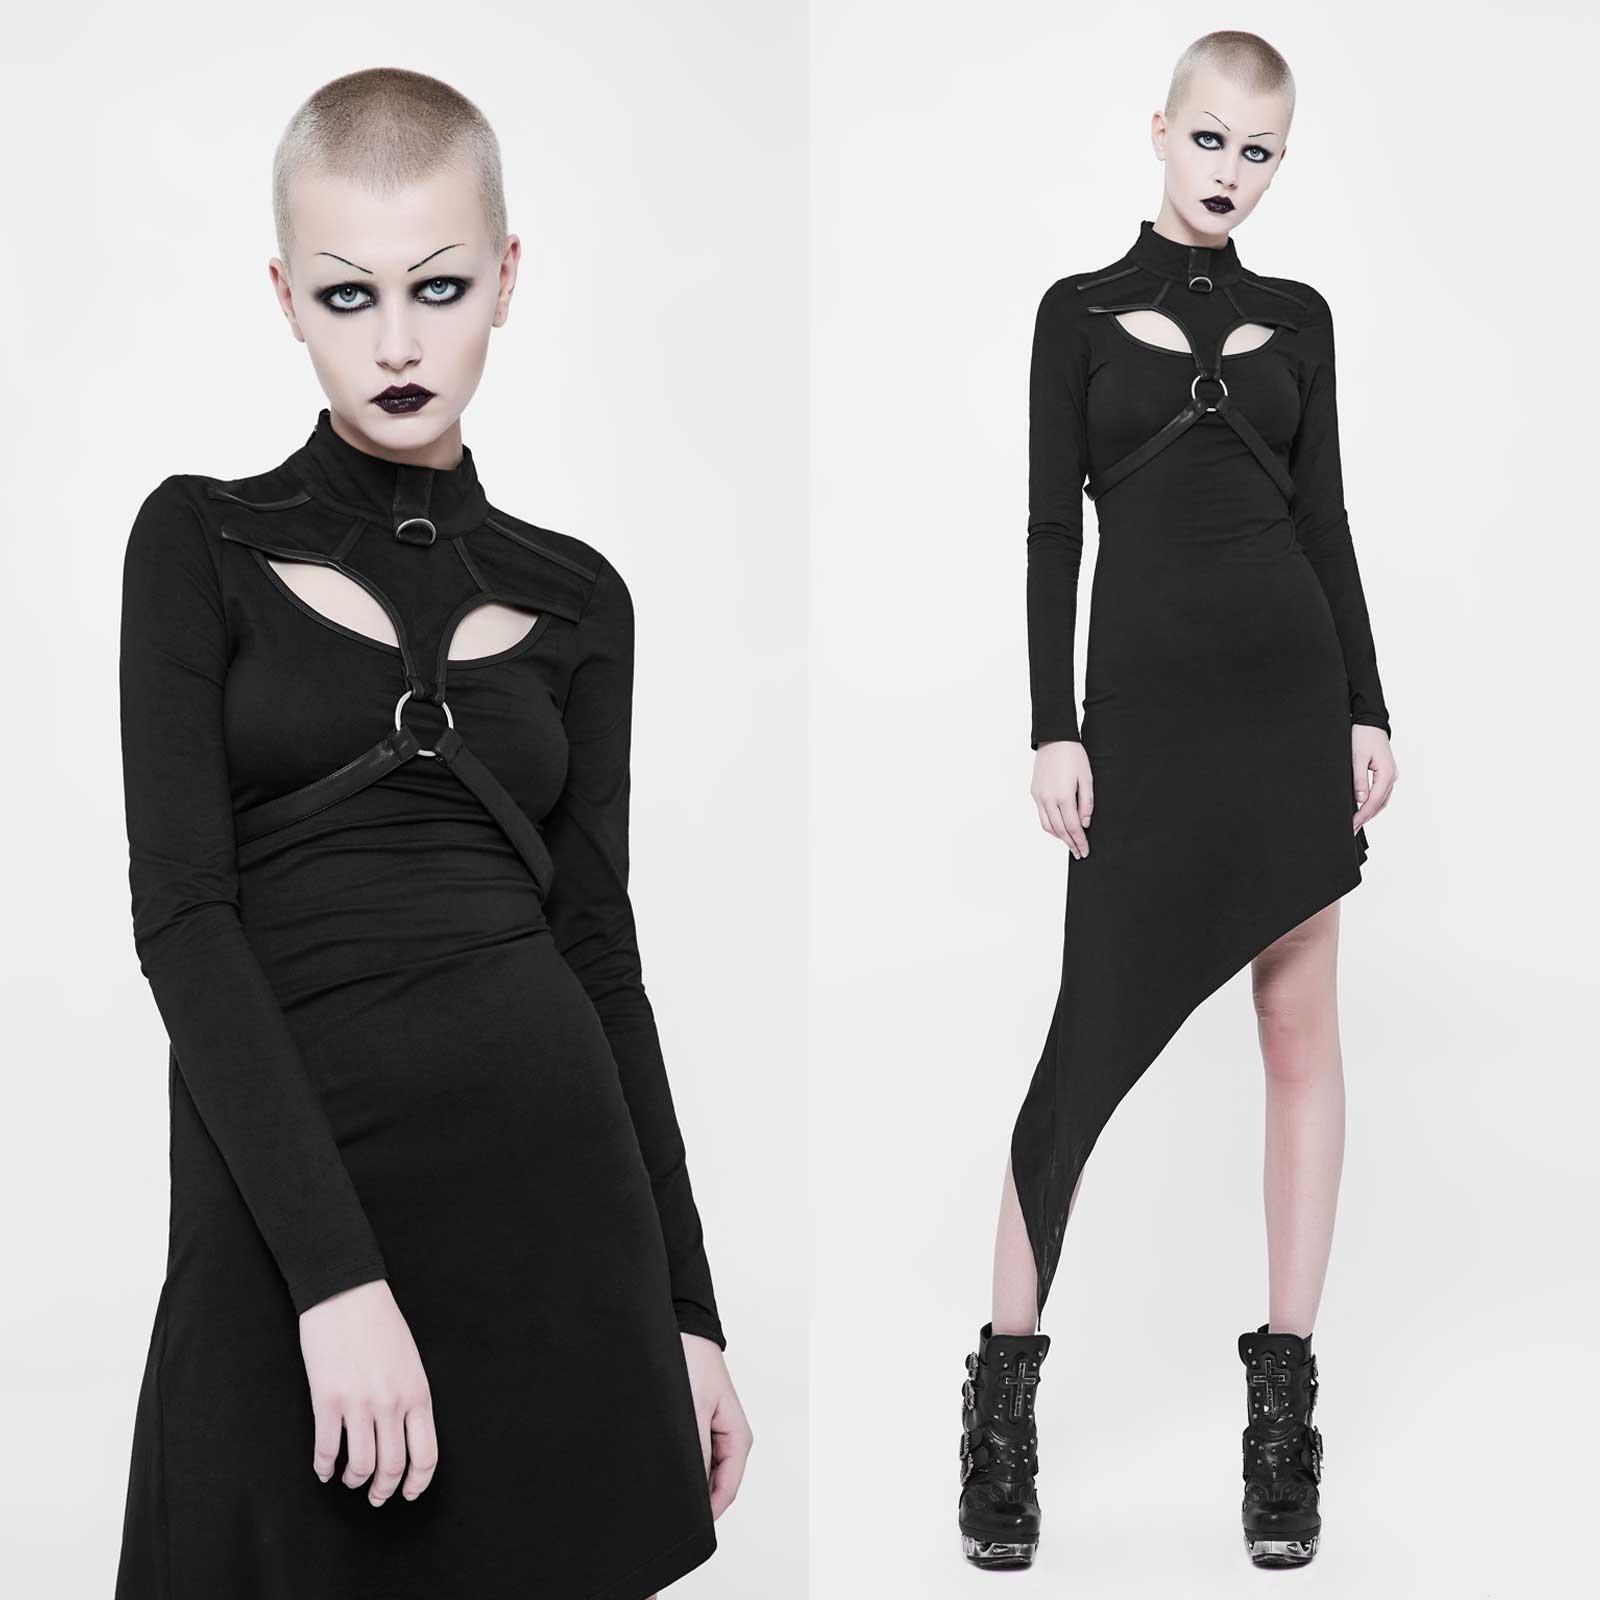 PUNK RAVE Cuspy Emo Dress Gothic Kleid Schwarz Asymmetrisch Leder-Kontraste